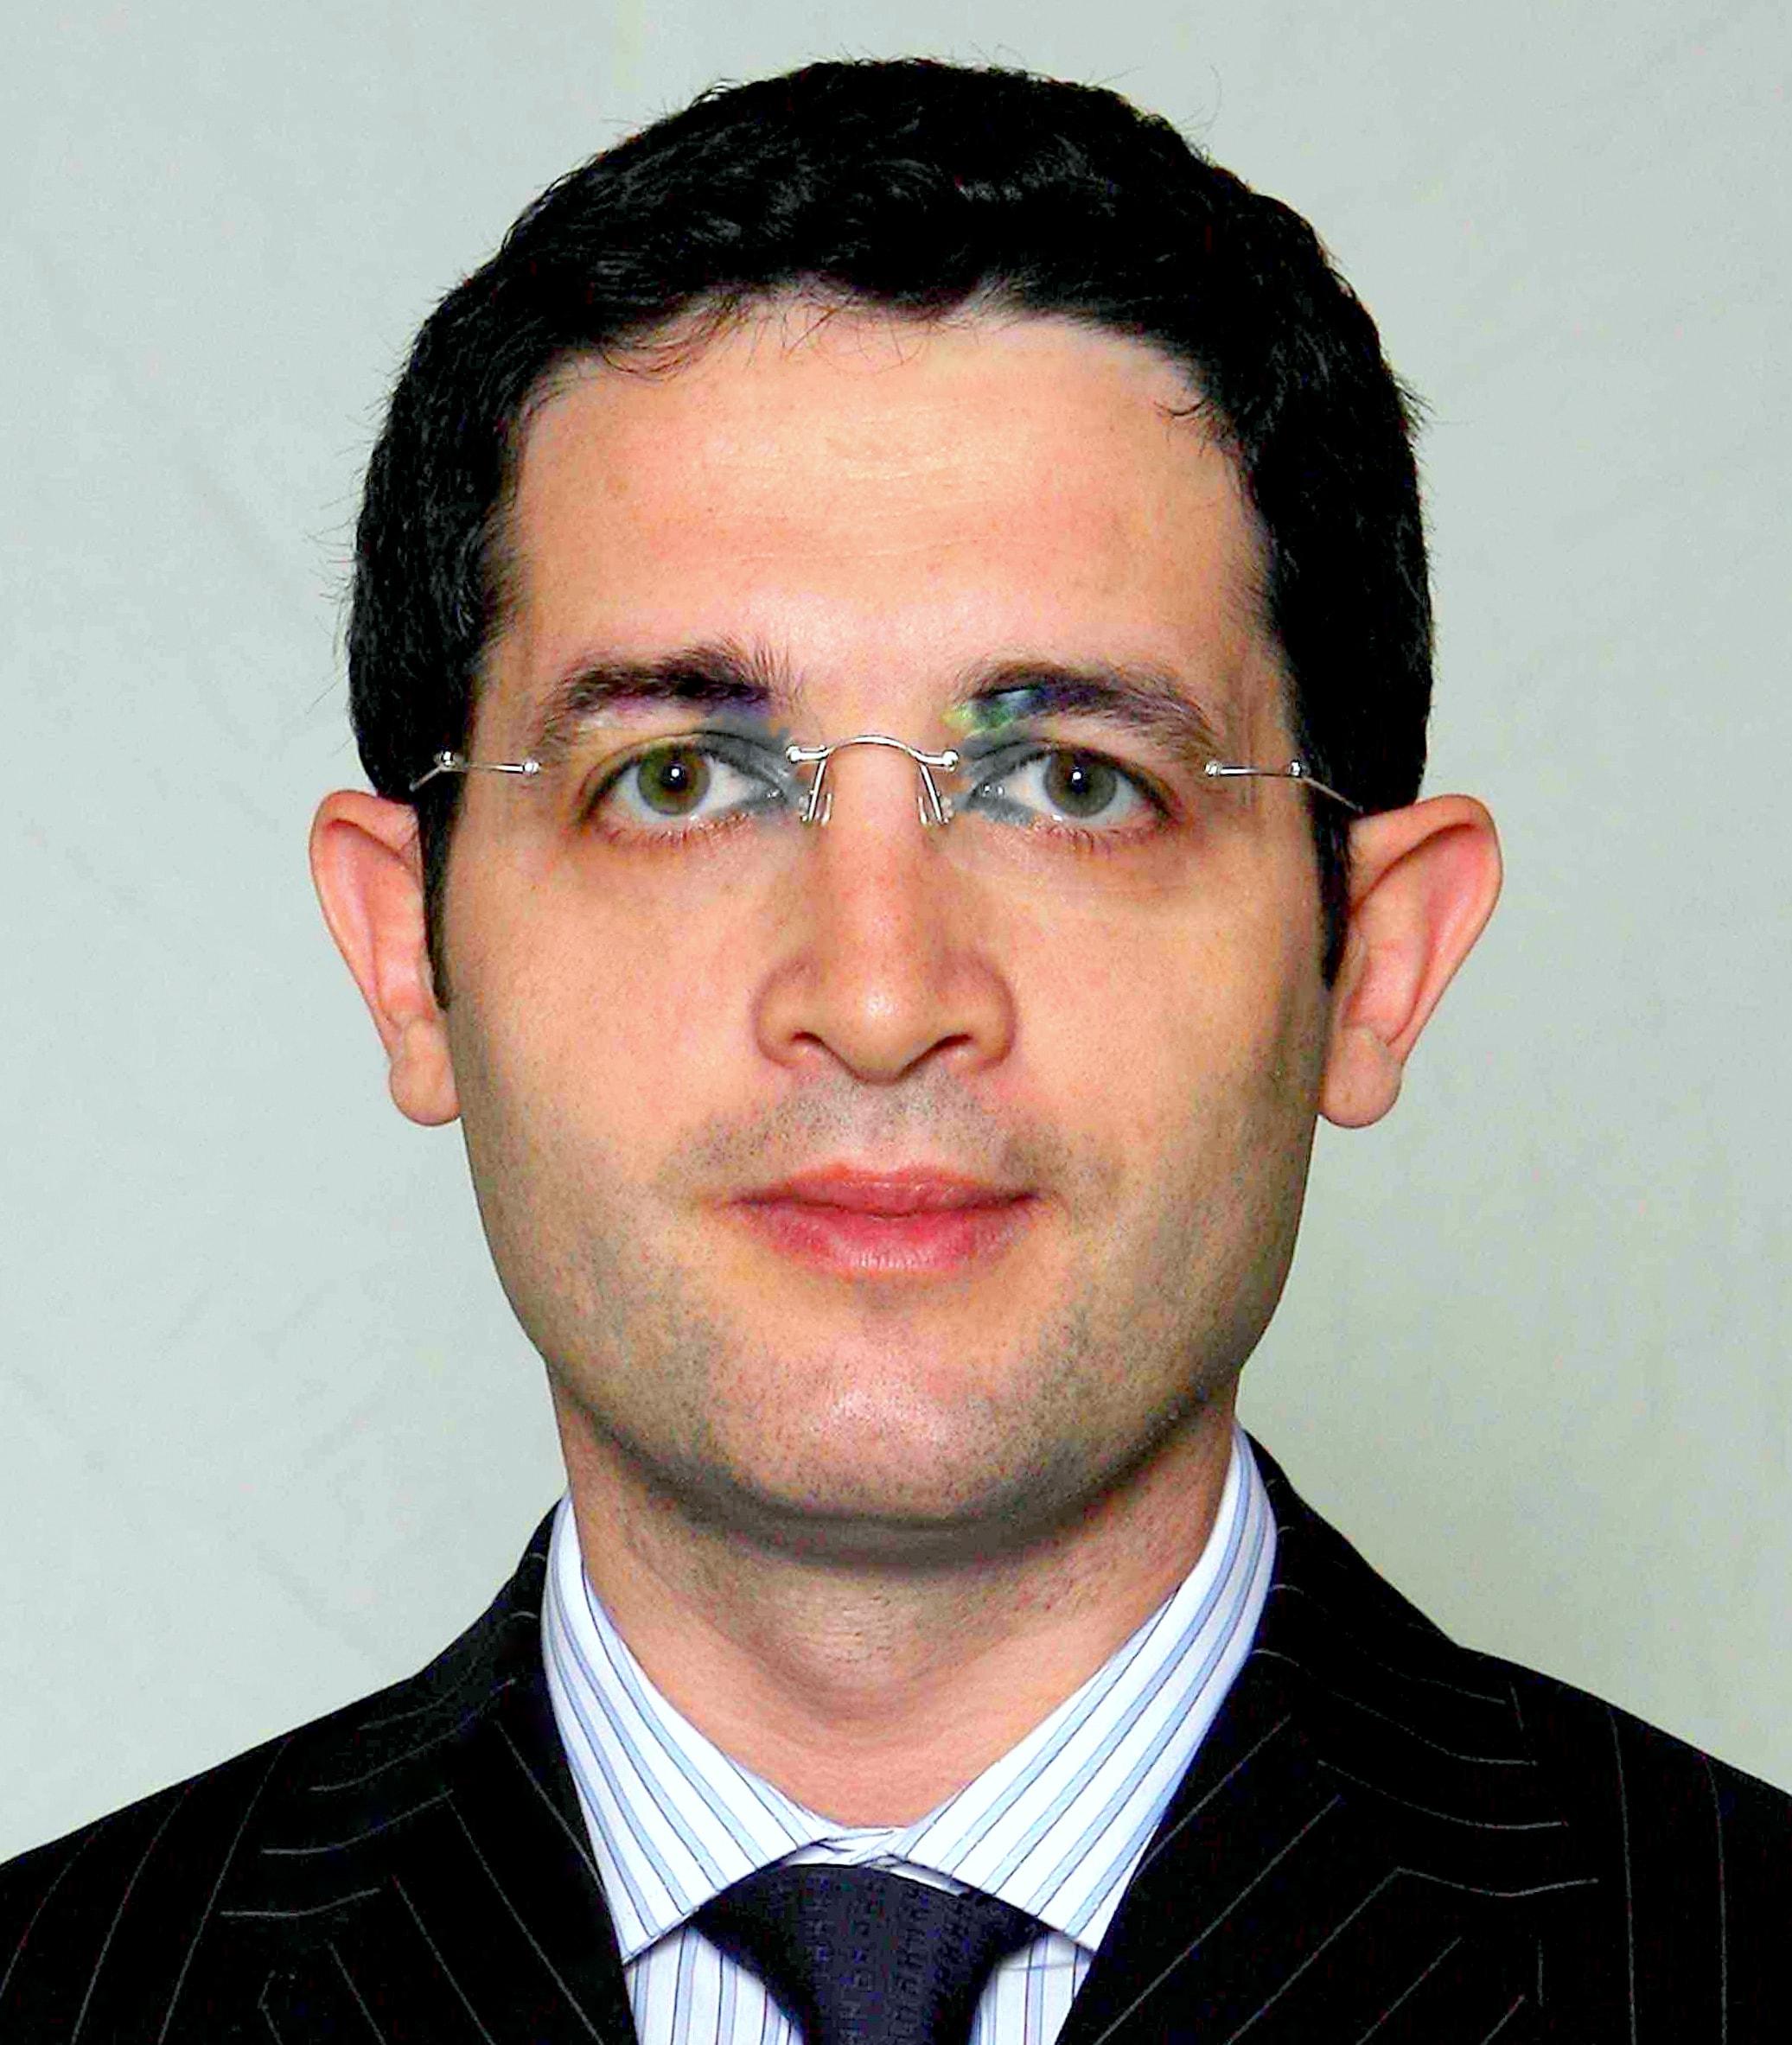 Pasquale Alberto Spani